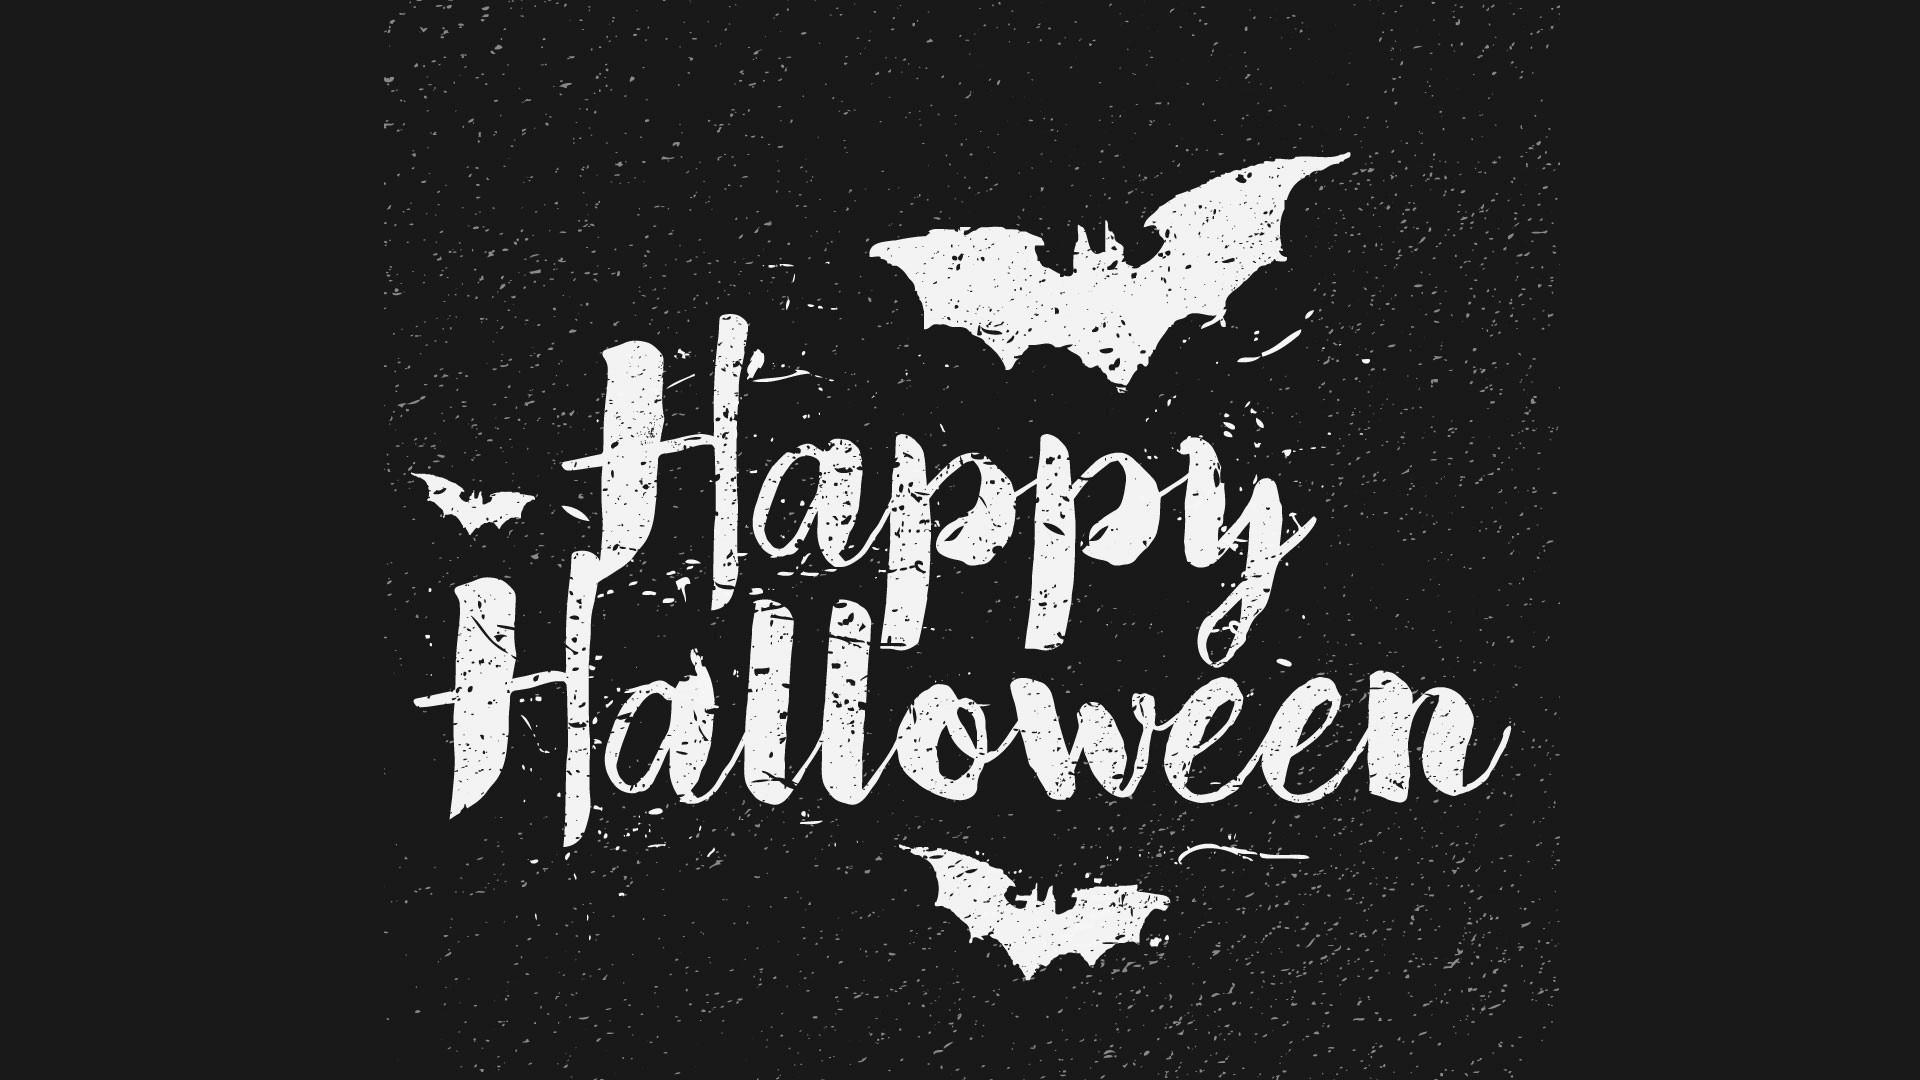 Happy Halloween HD Wallpapers HD Wallpapers 1920x1080